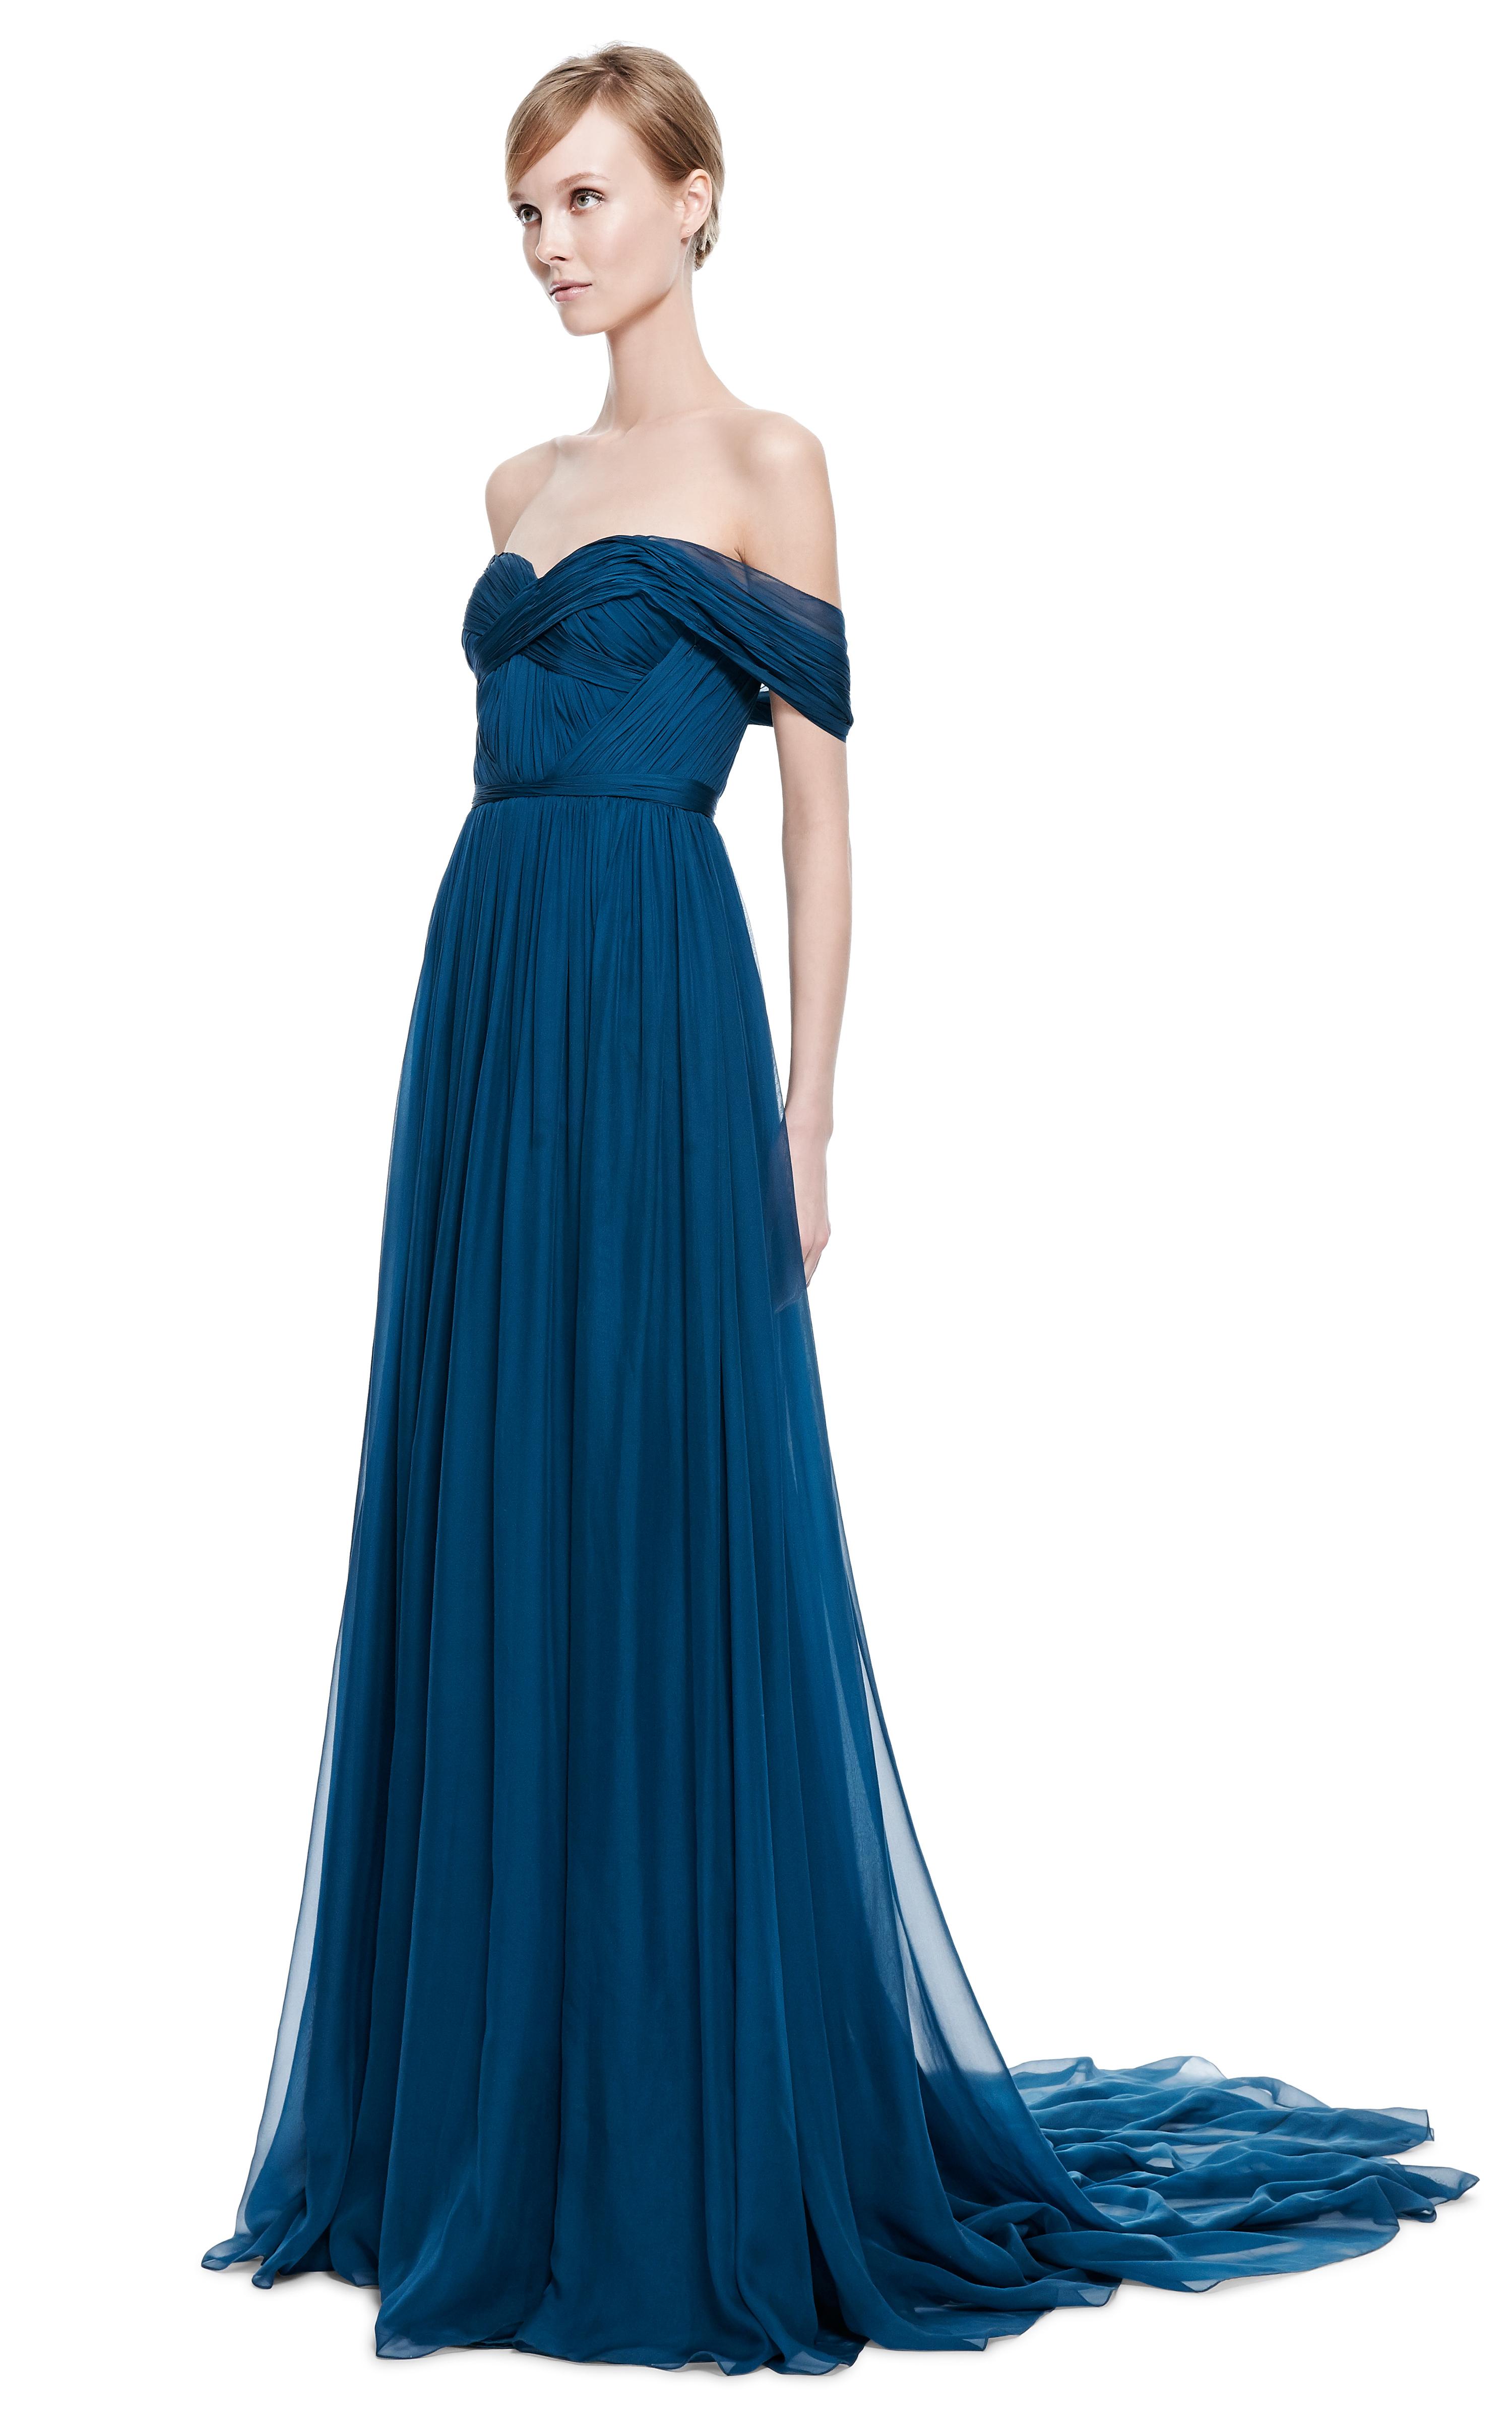 Lyst Marchesa Teal Chiffon Offtheshoulder Gown In Blue